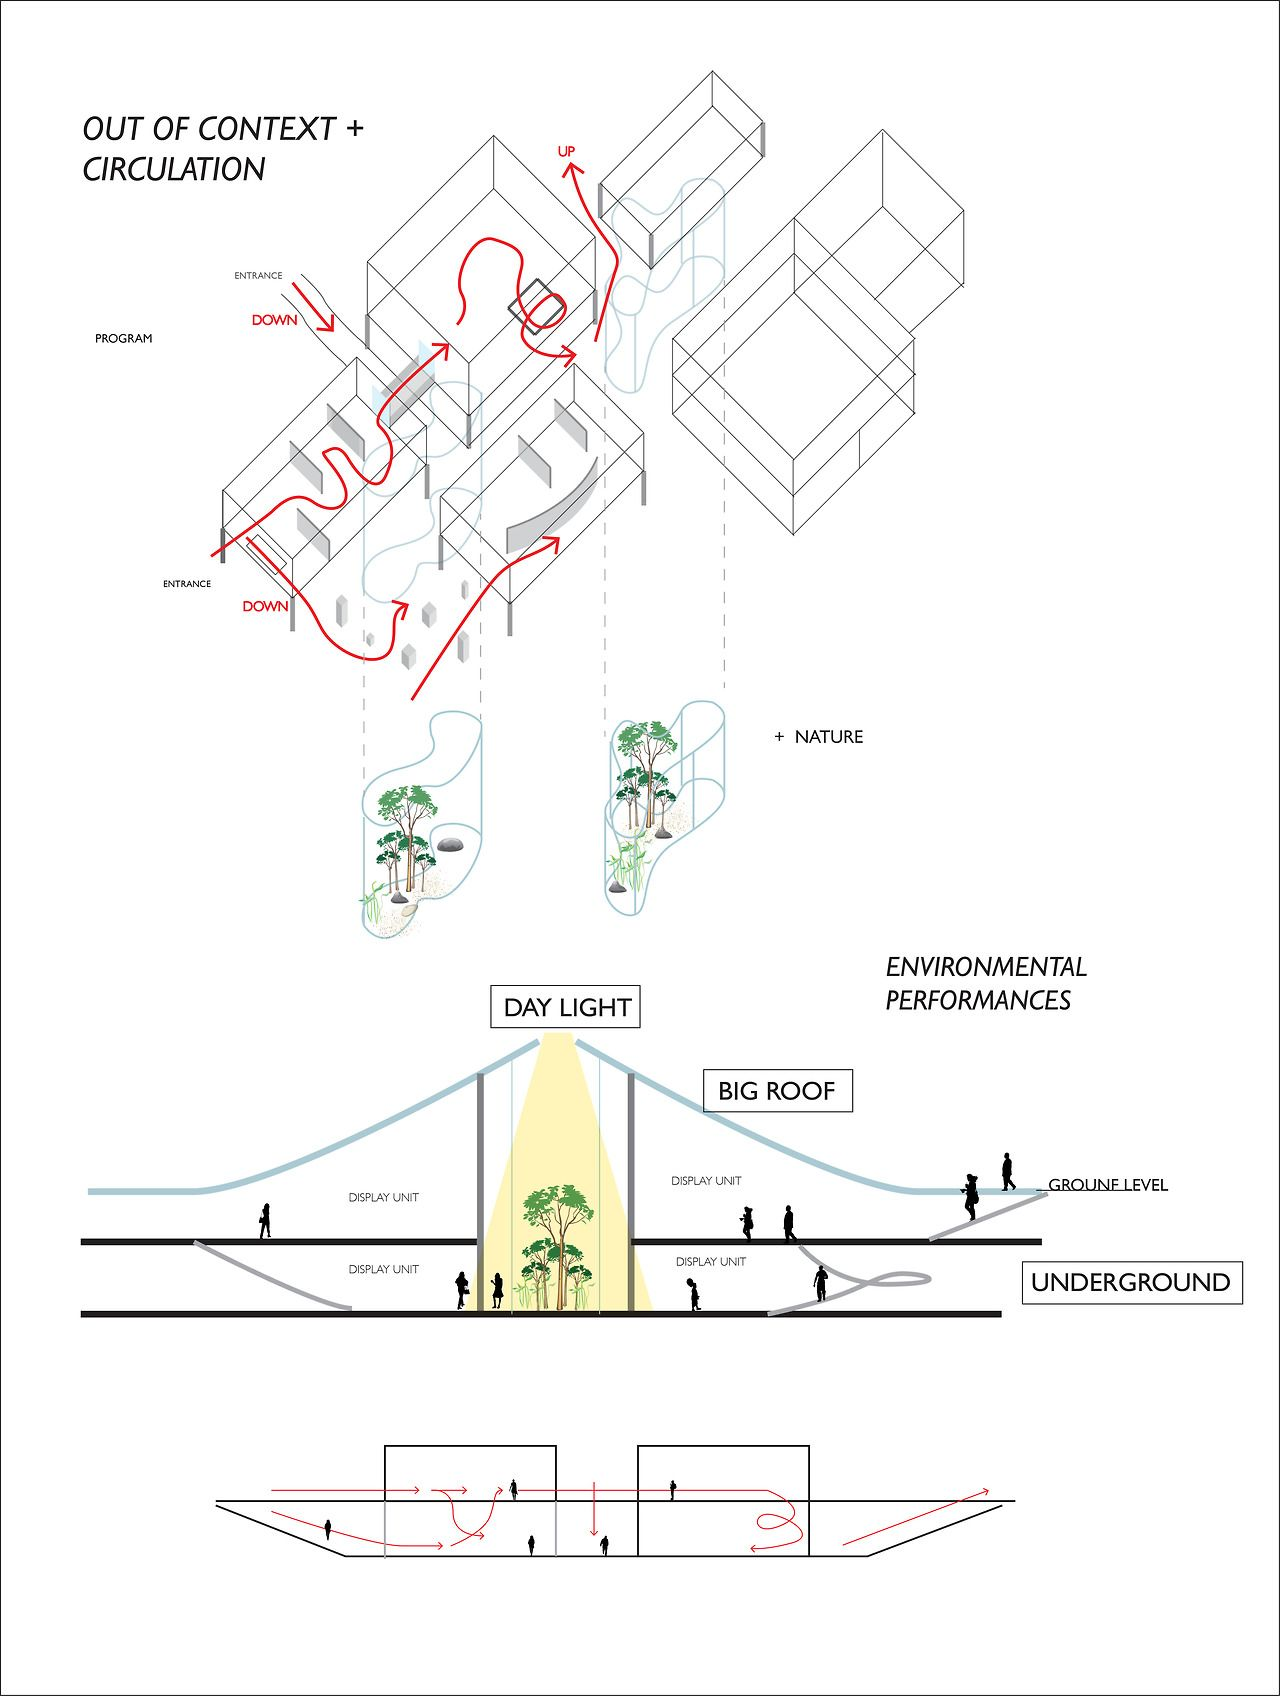 chacha chanya niyomsith 5434726425 section and circulation diagram illustrating the environmental performances and circulation [ 1280 x 1696 Pixel ]